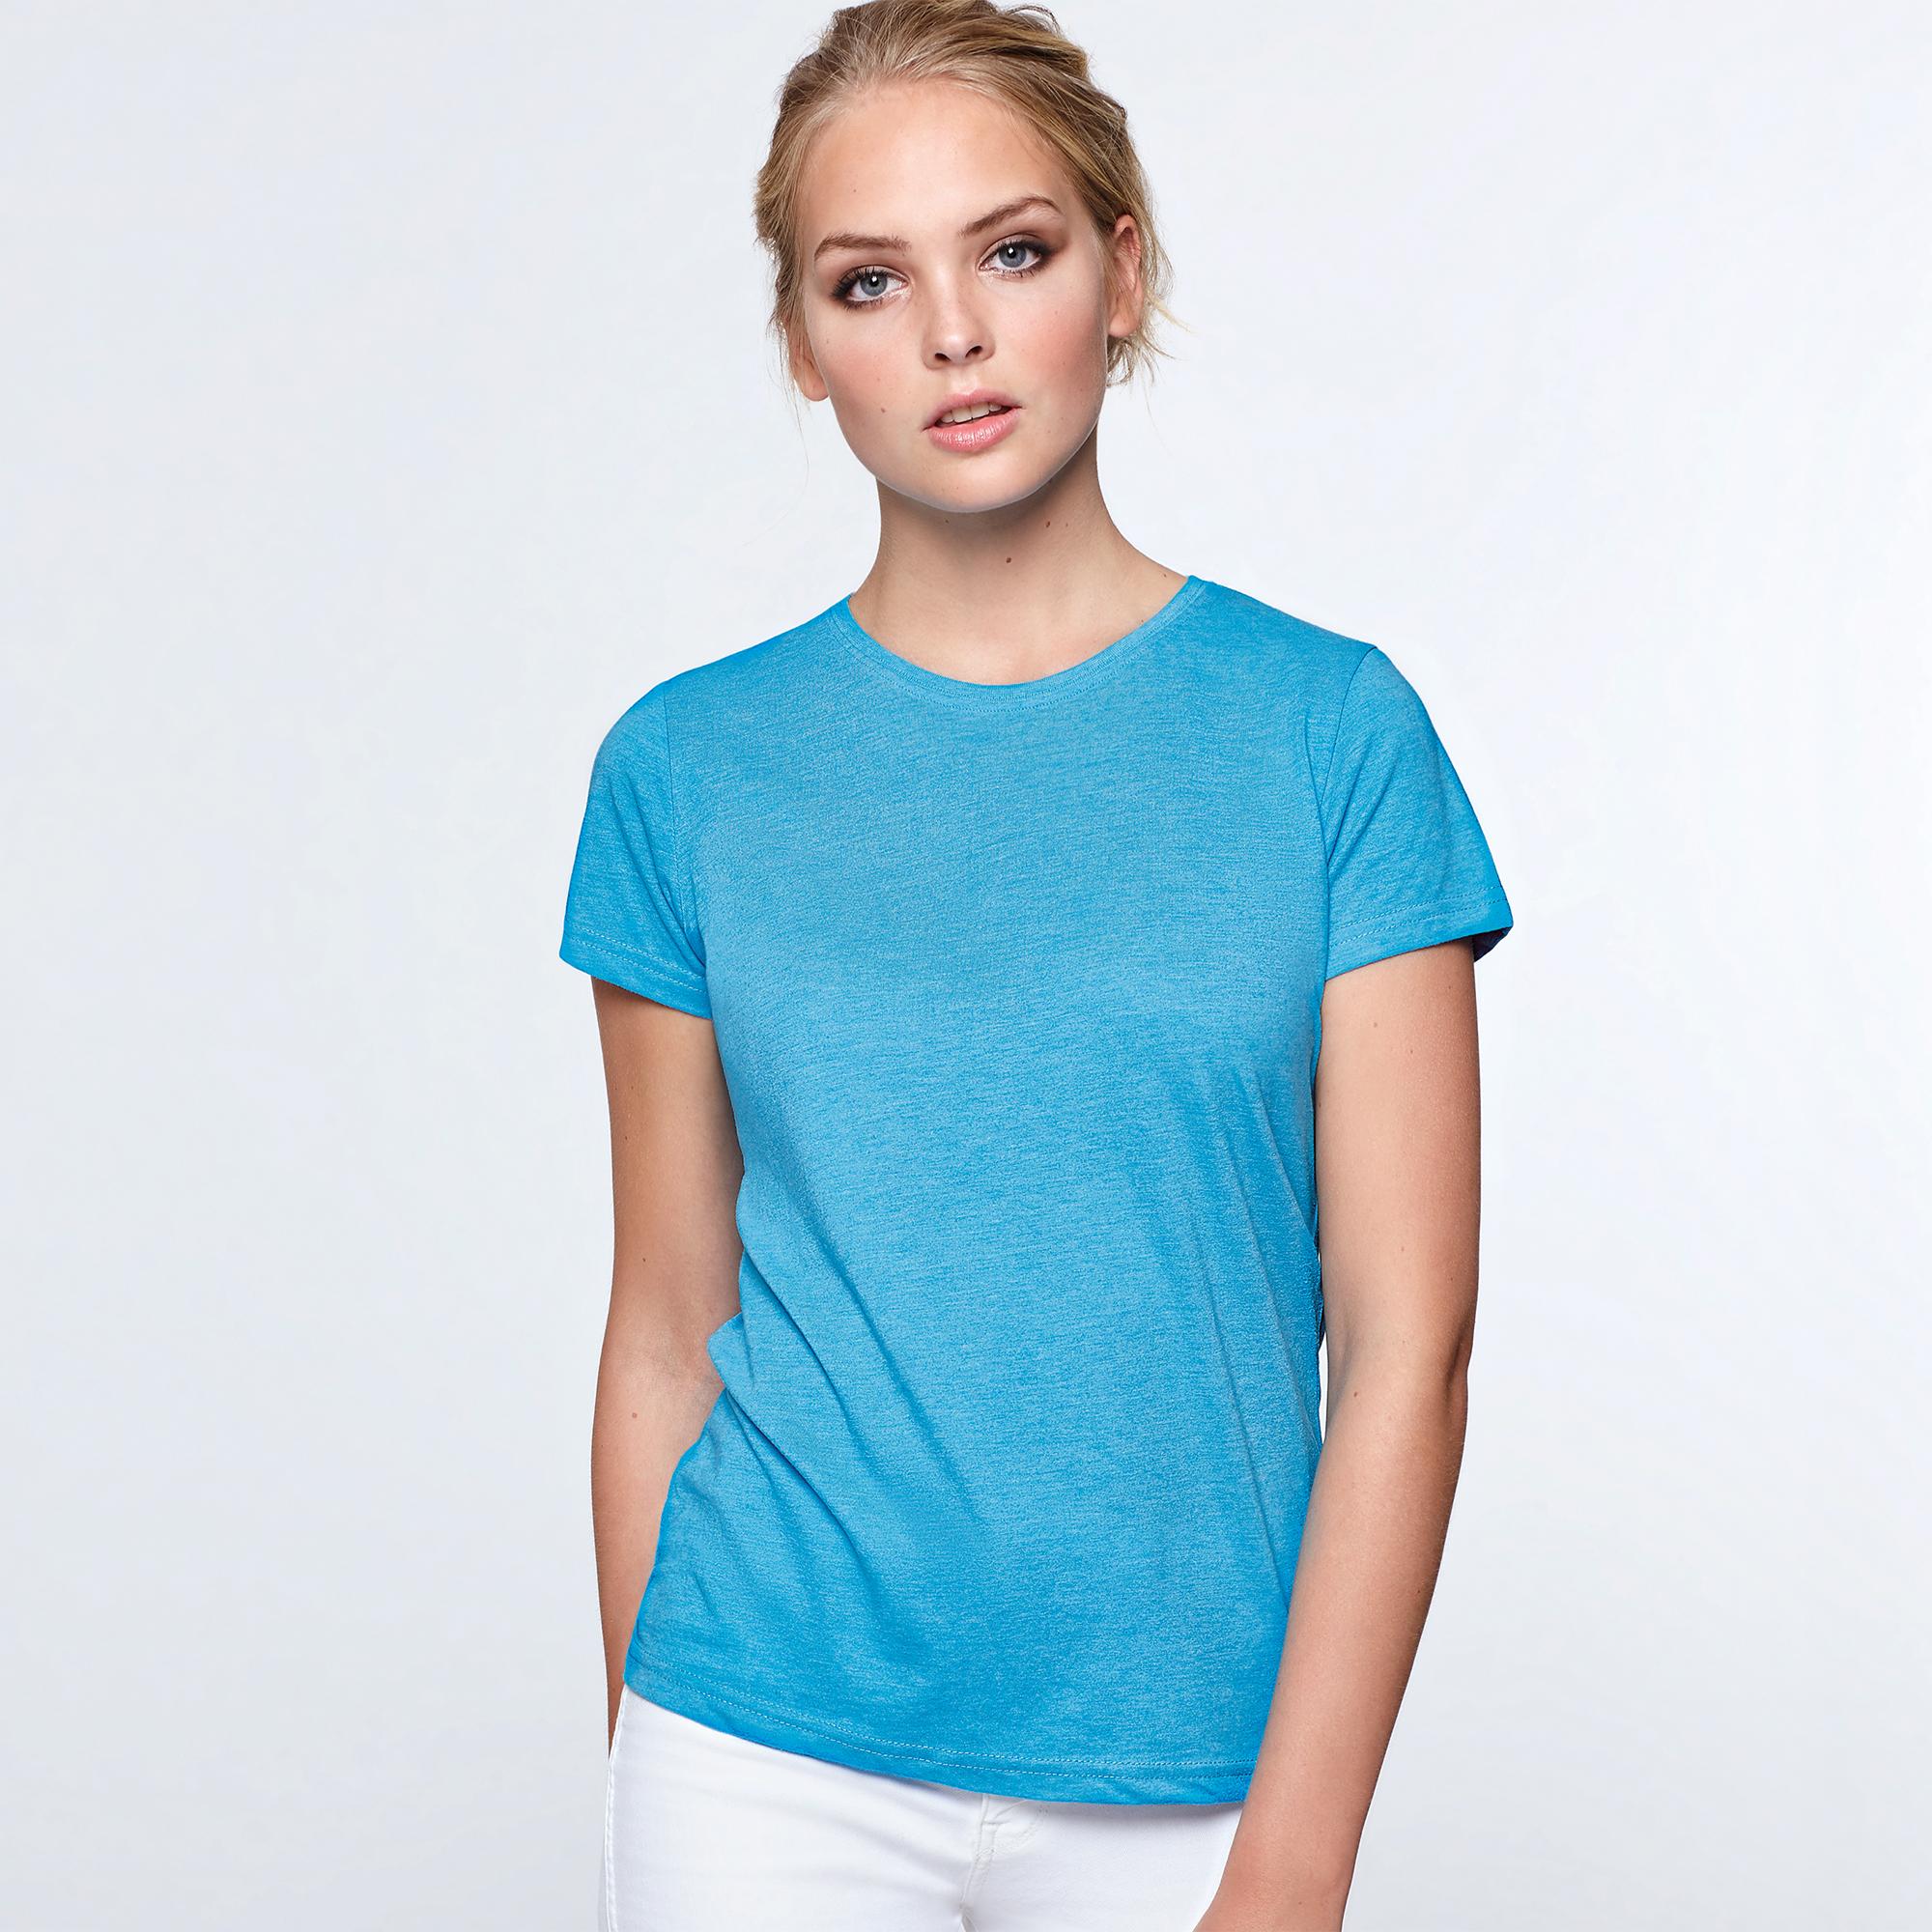 f18e0fd7 T-shirt promotional Fox Woman (CA6661) | Roly